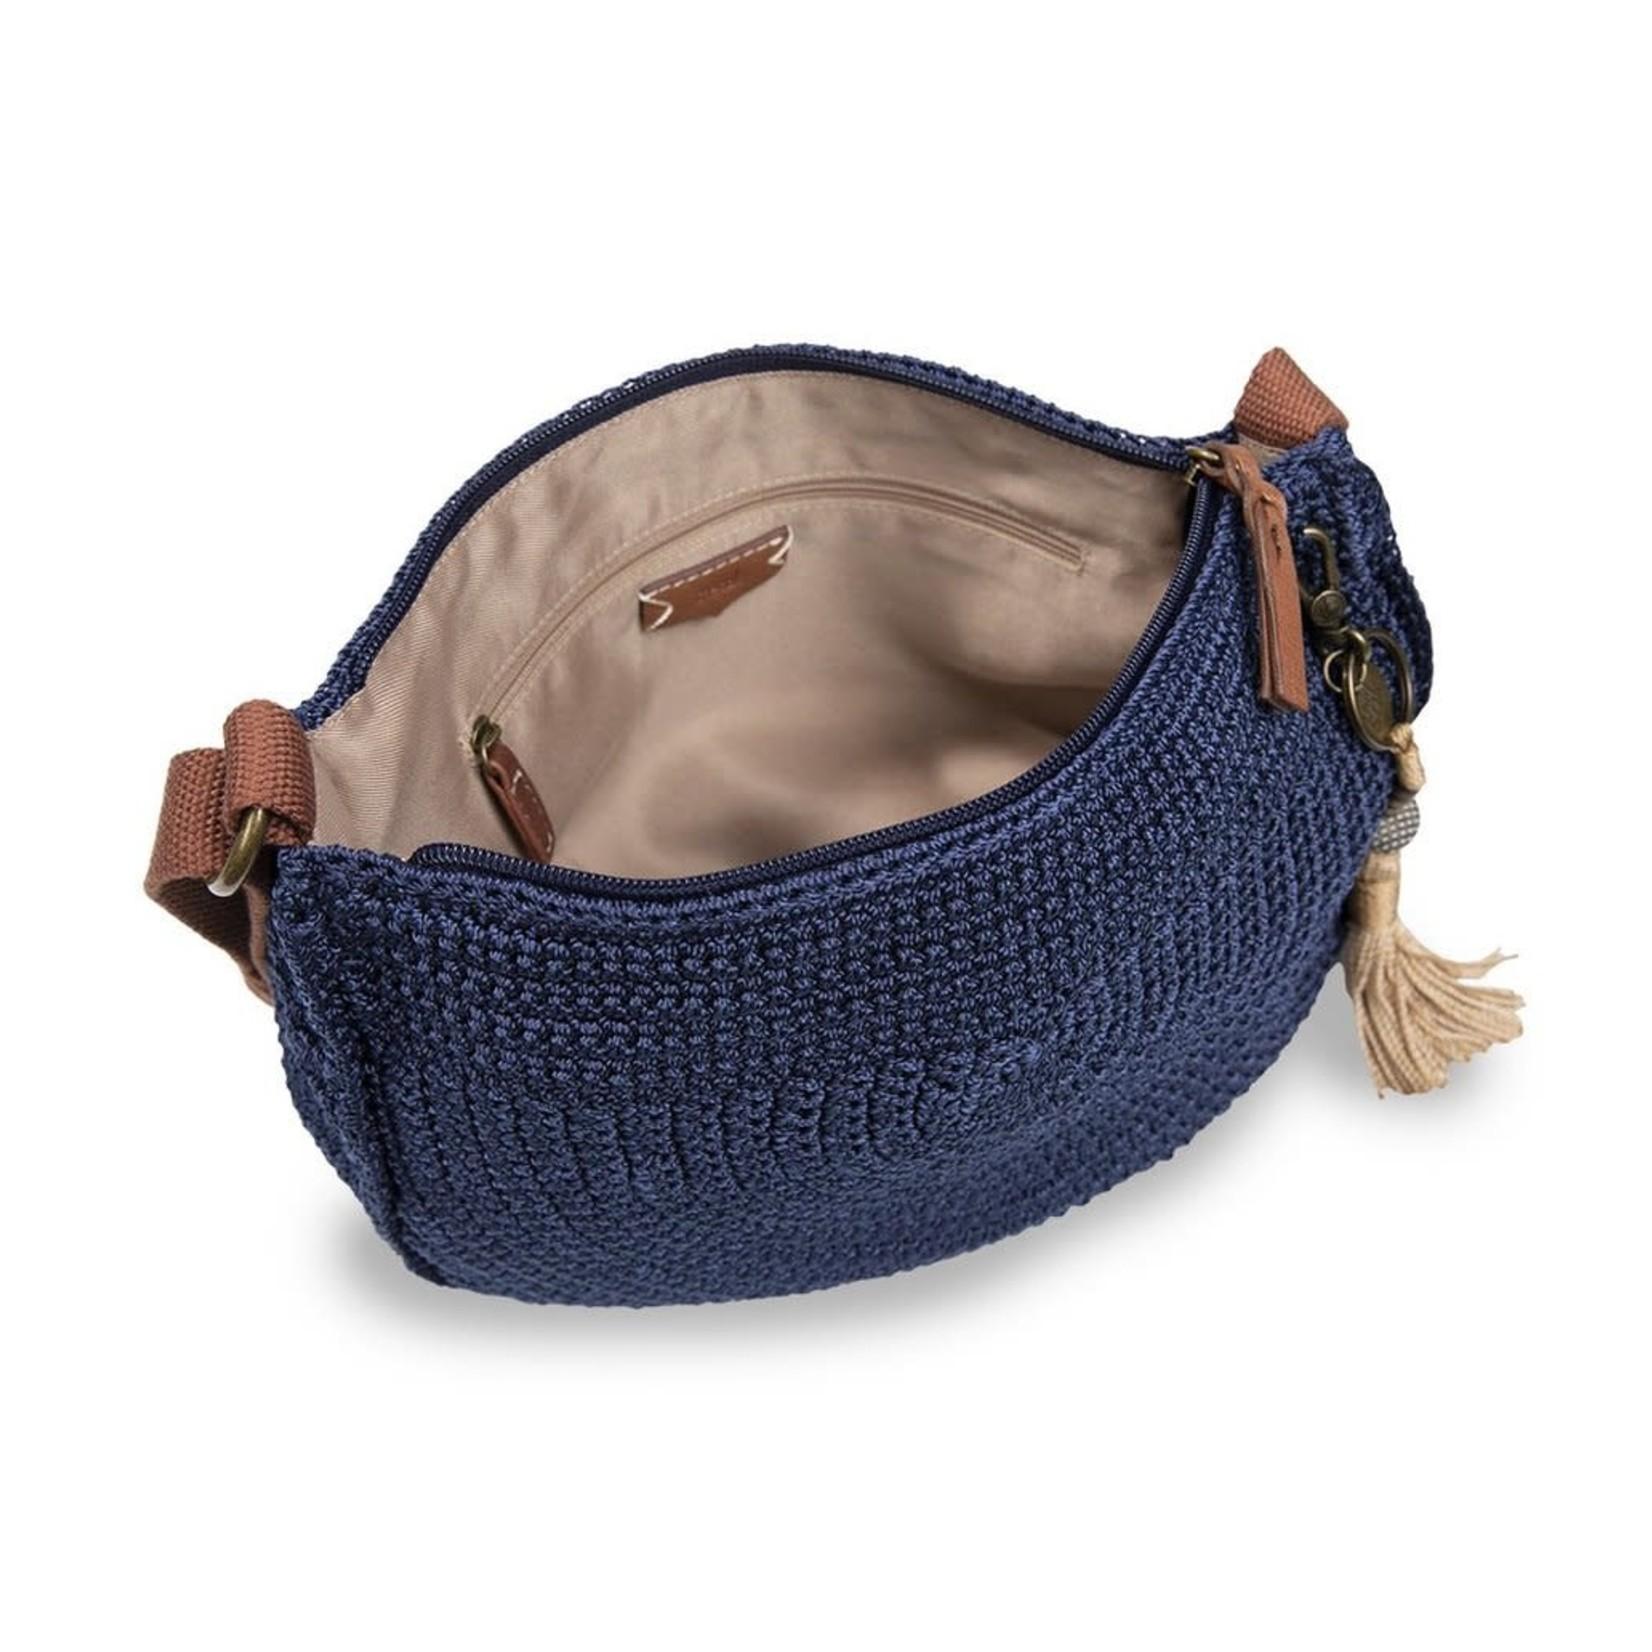 The Sak Ryder Crochet Crossbody - Denim